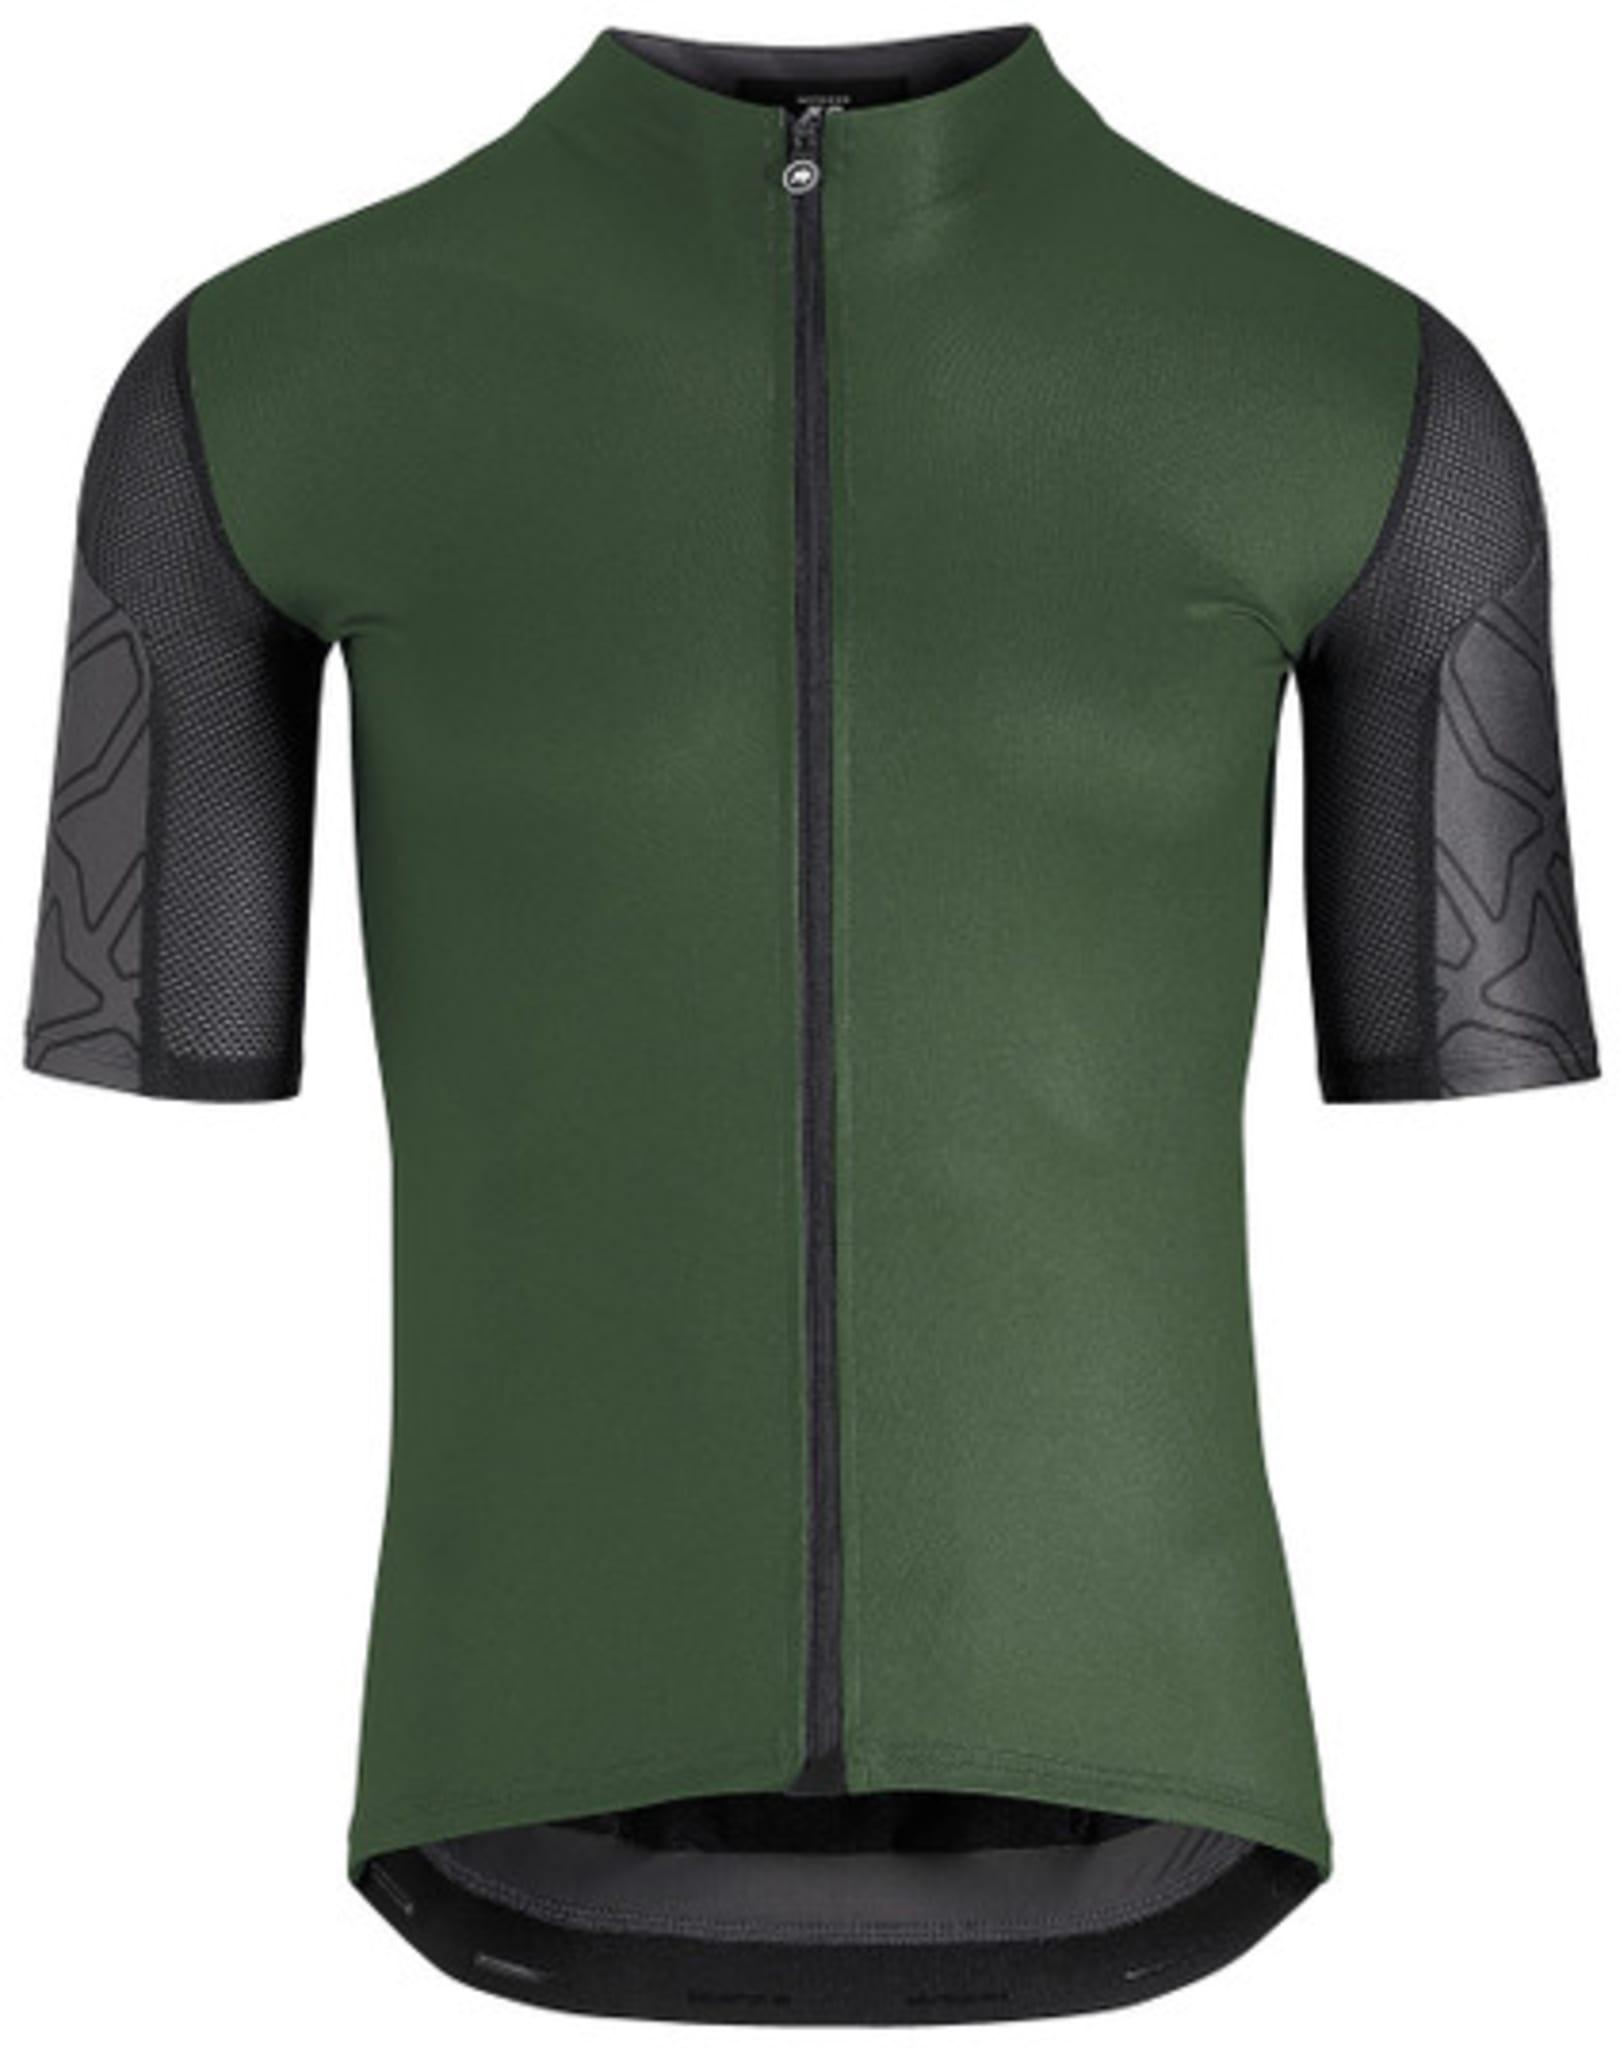 XC Short Sleeve Jersey M